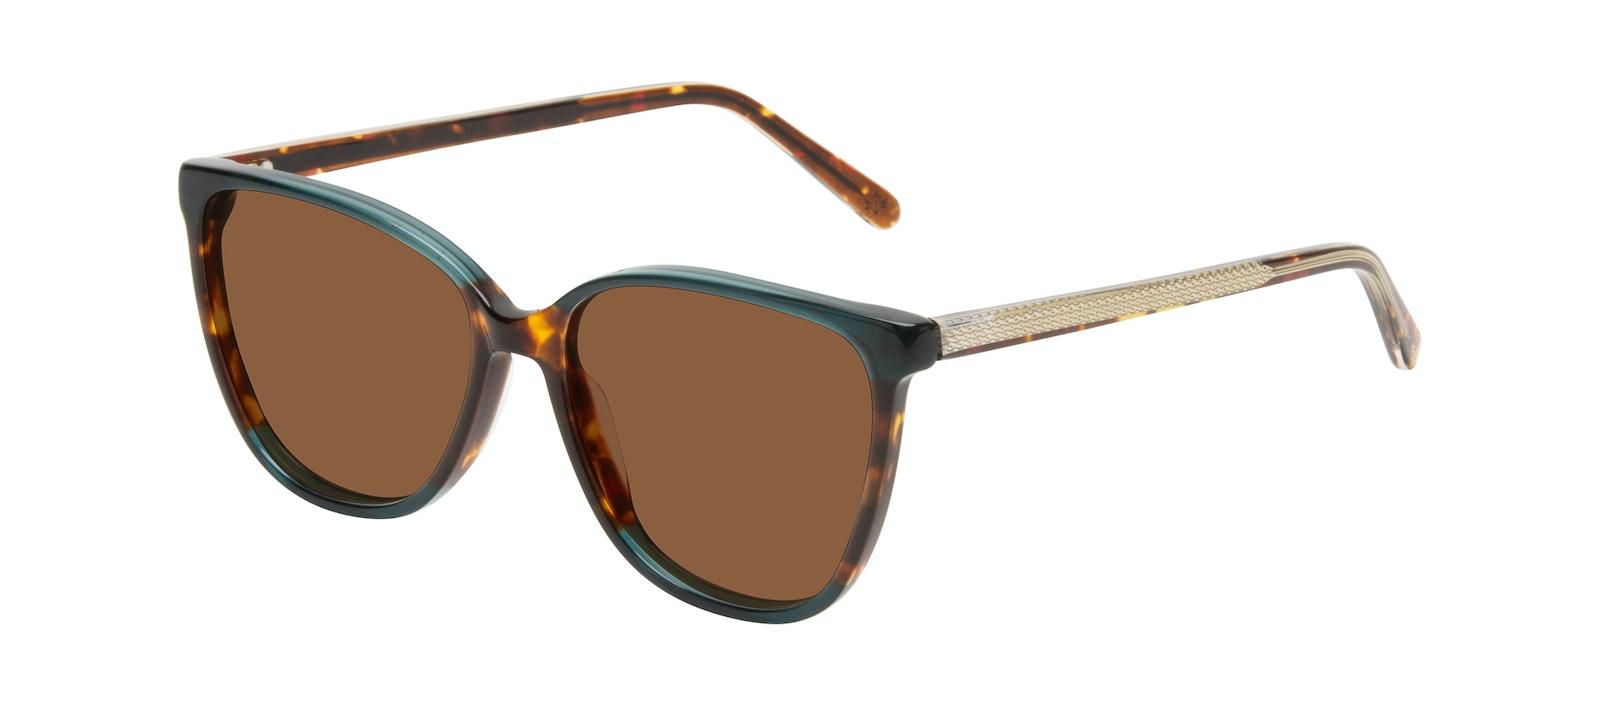 Affordable Fashion Glasses Square Sunglasses Women Flora Pine Tilt